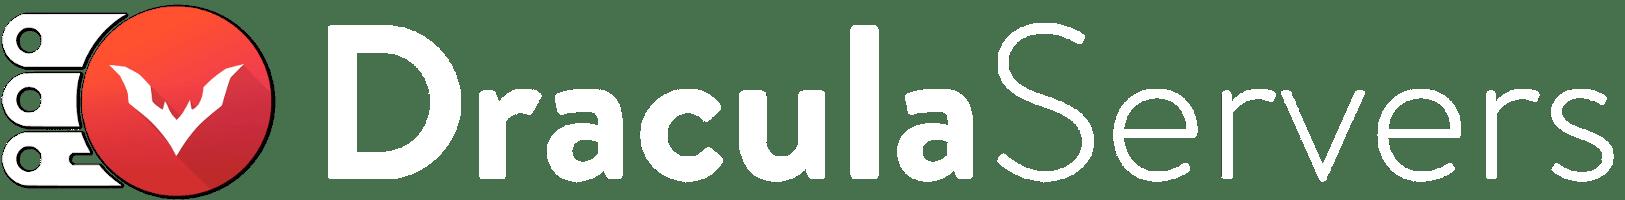 DraculaServers Logo